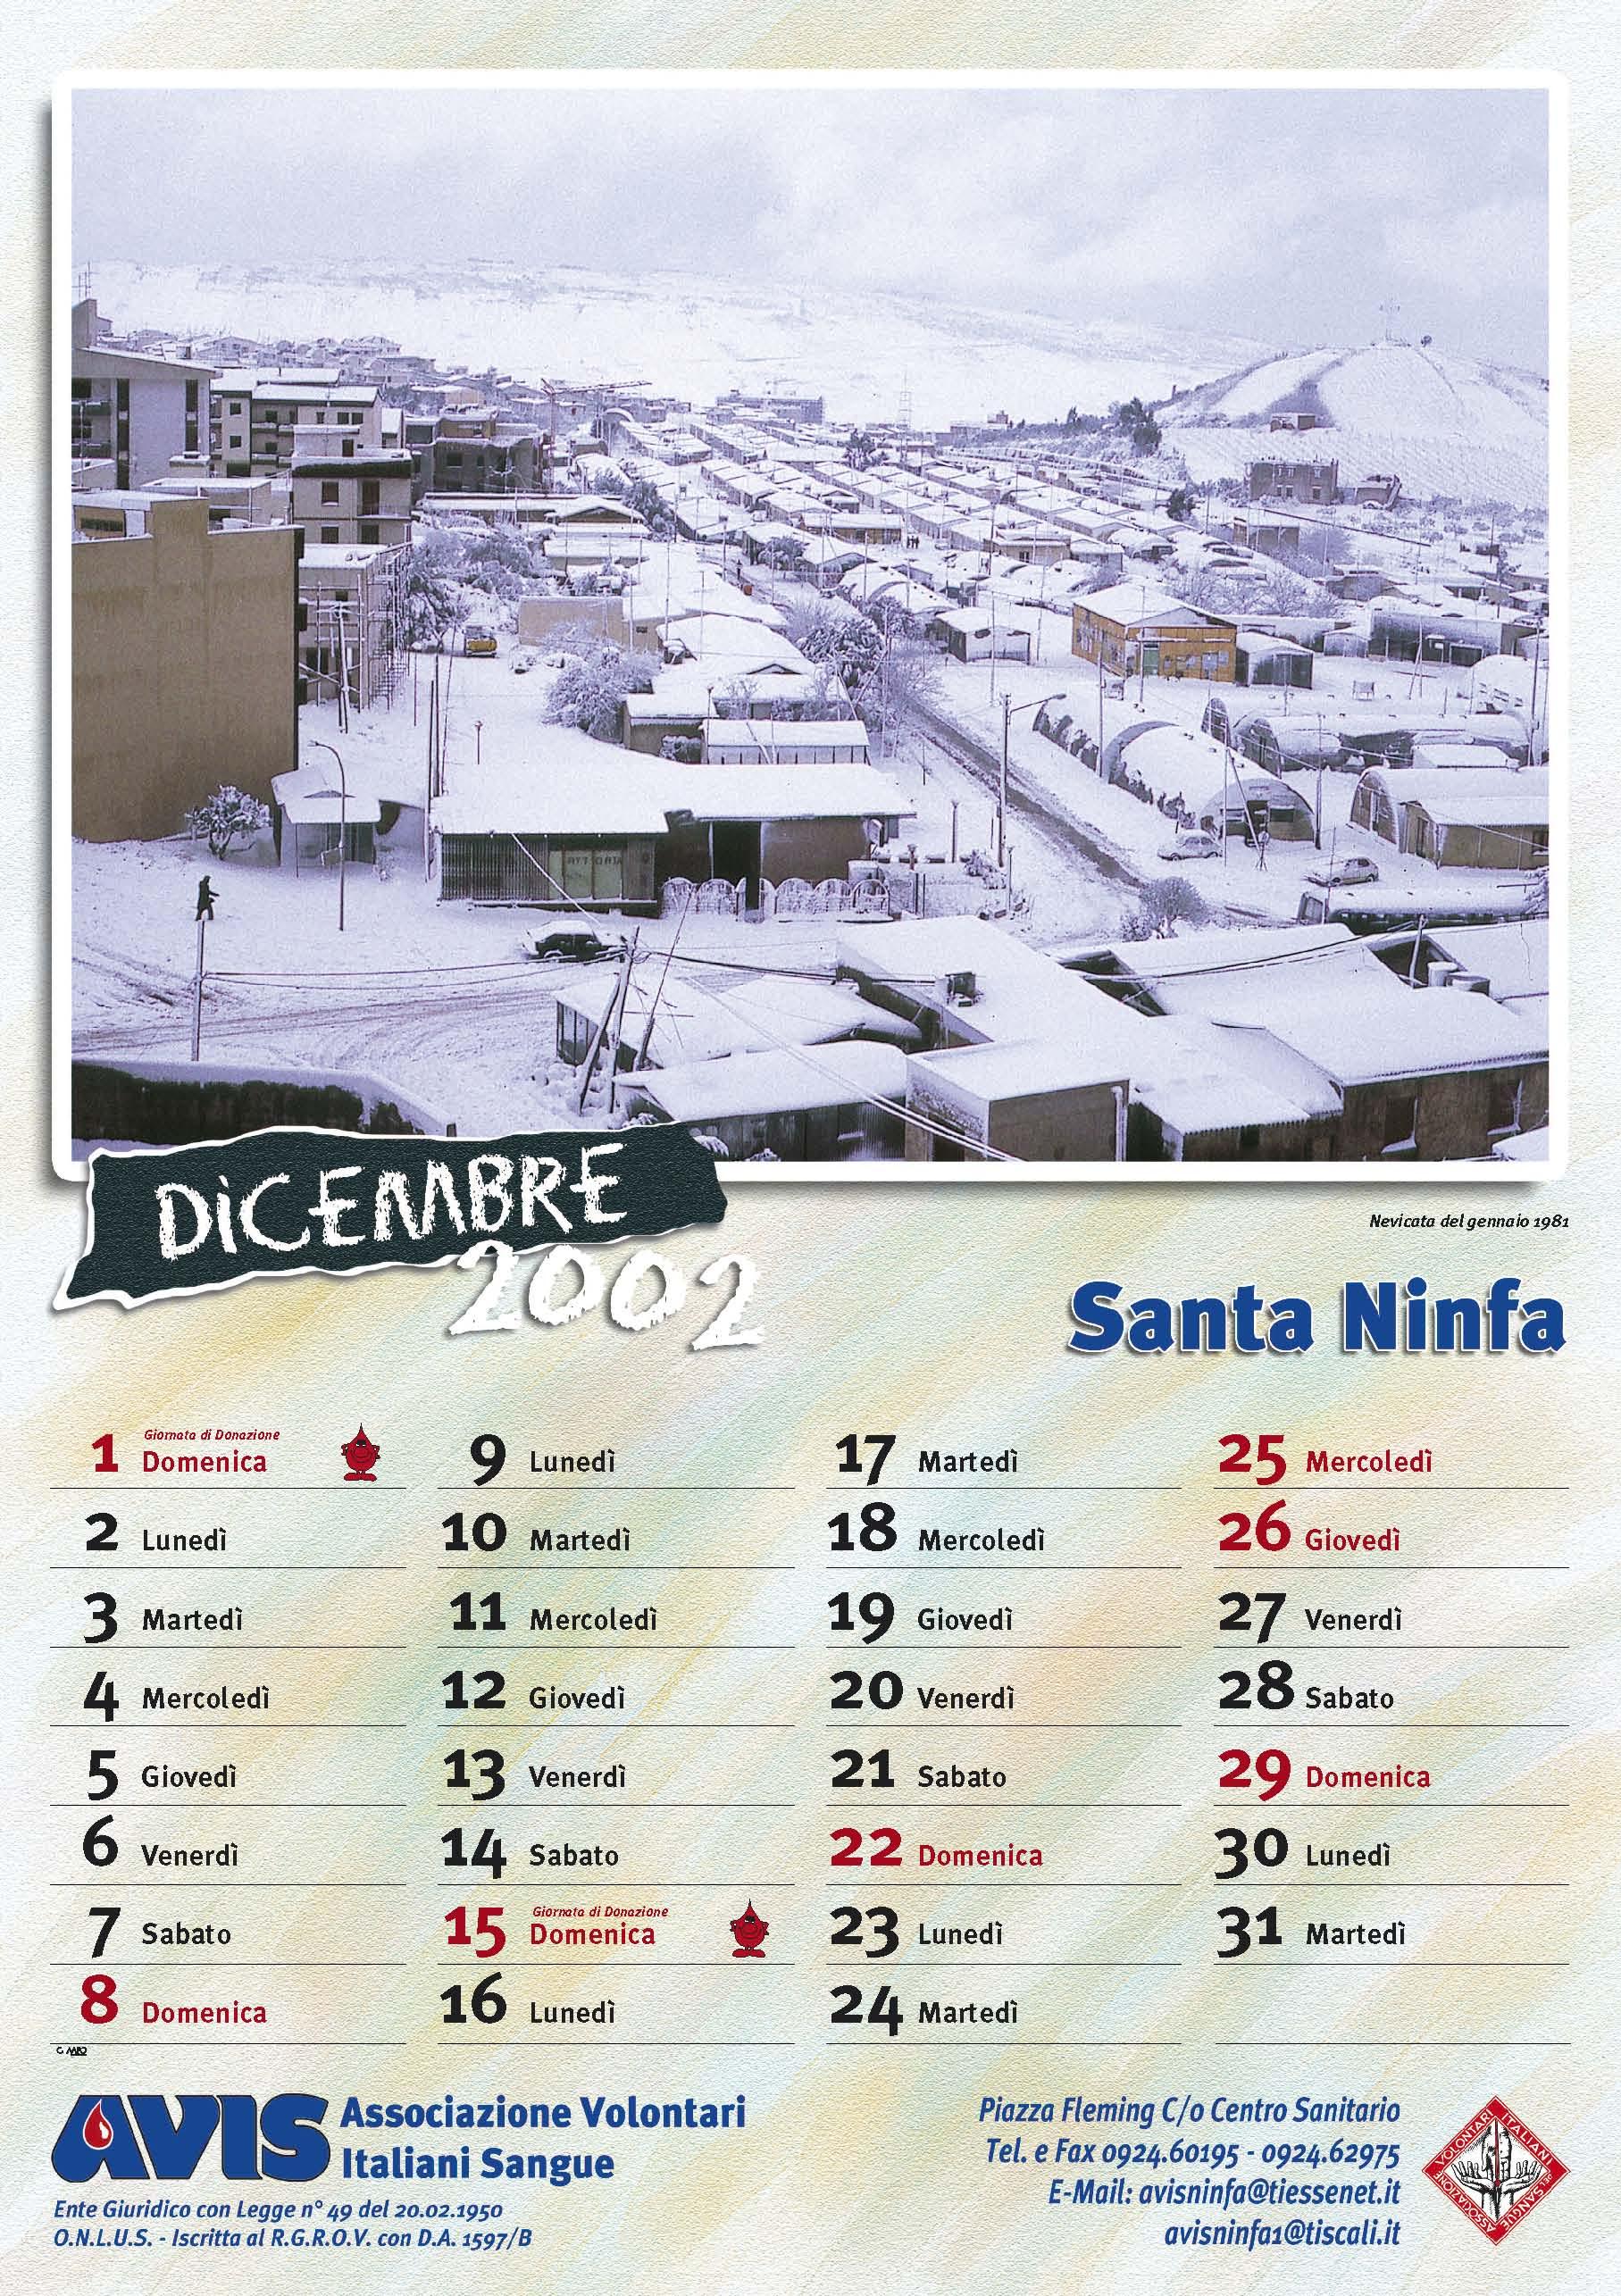 Calendario Avis.Calendario Avis 2002 Avis Santa Ninfa